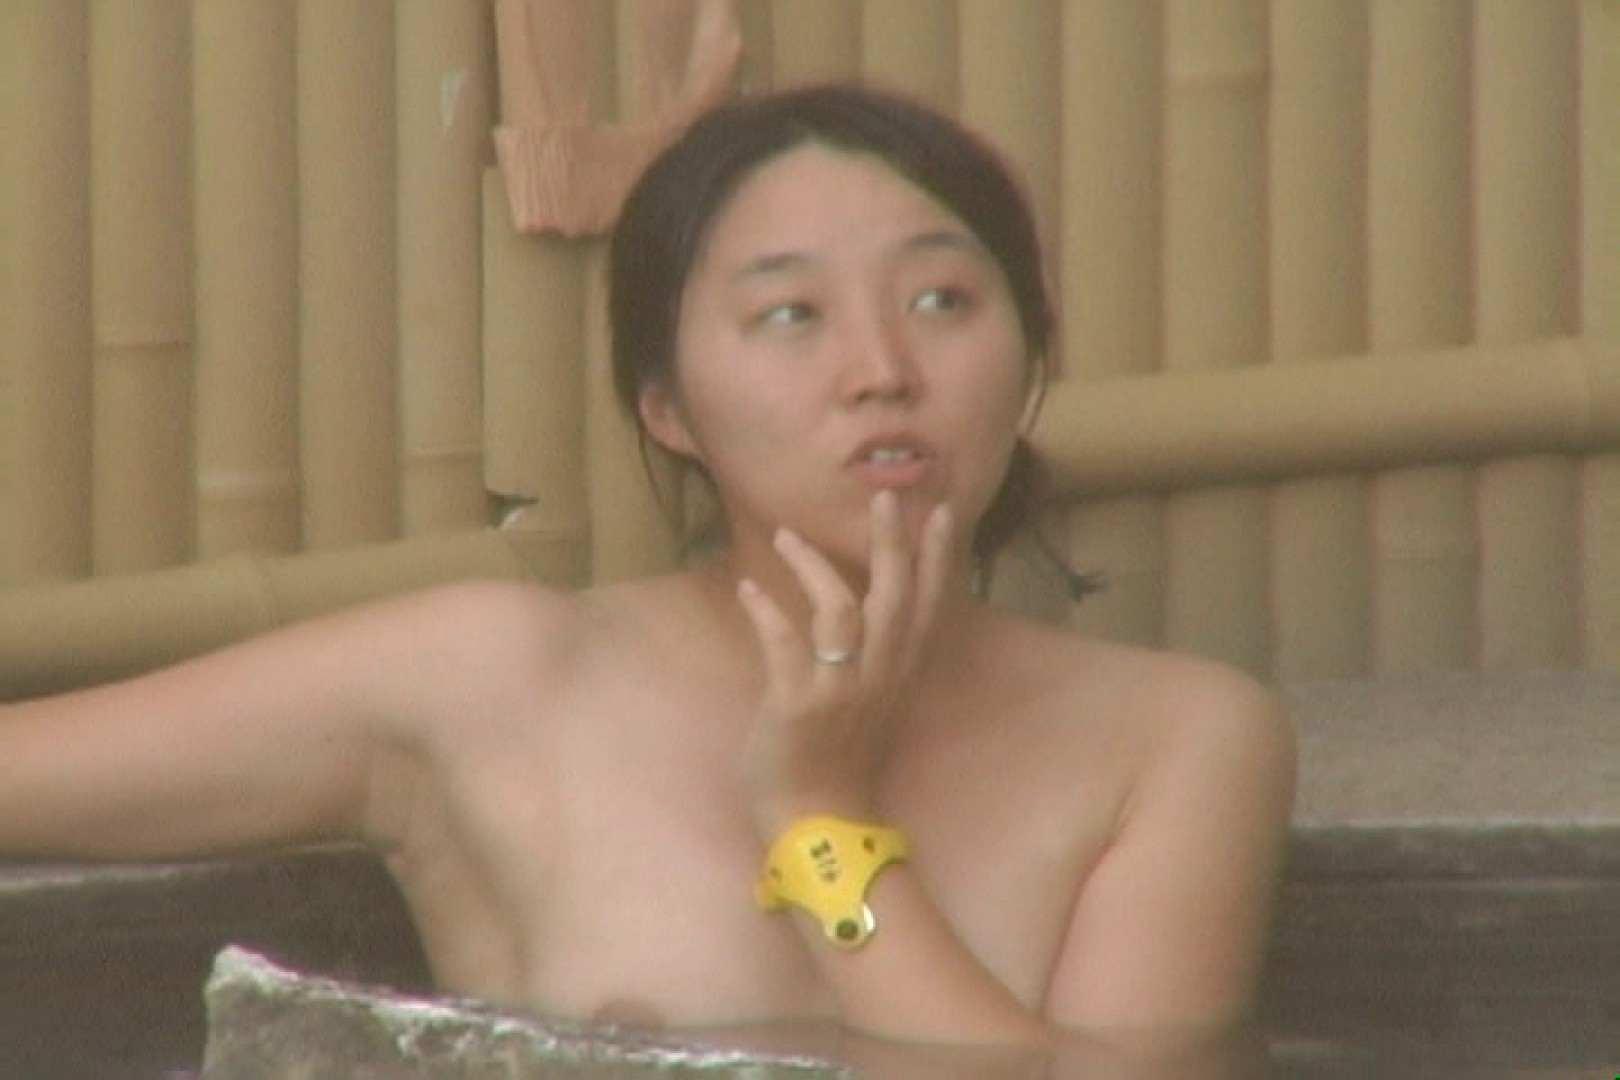 Aquaな露天風呂Vol.26【VIP】 露天風呂突入 | 美しいOLの裸体  73pic 34